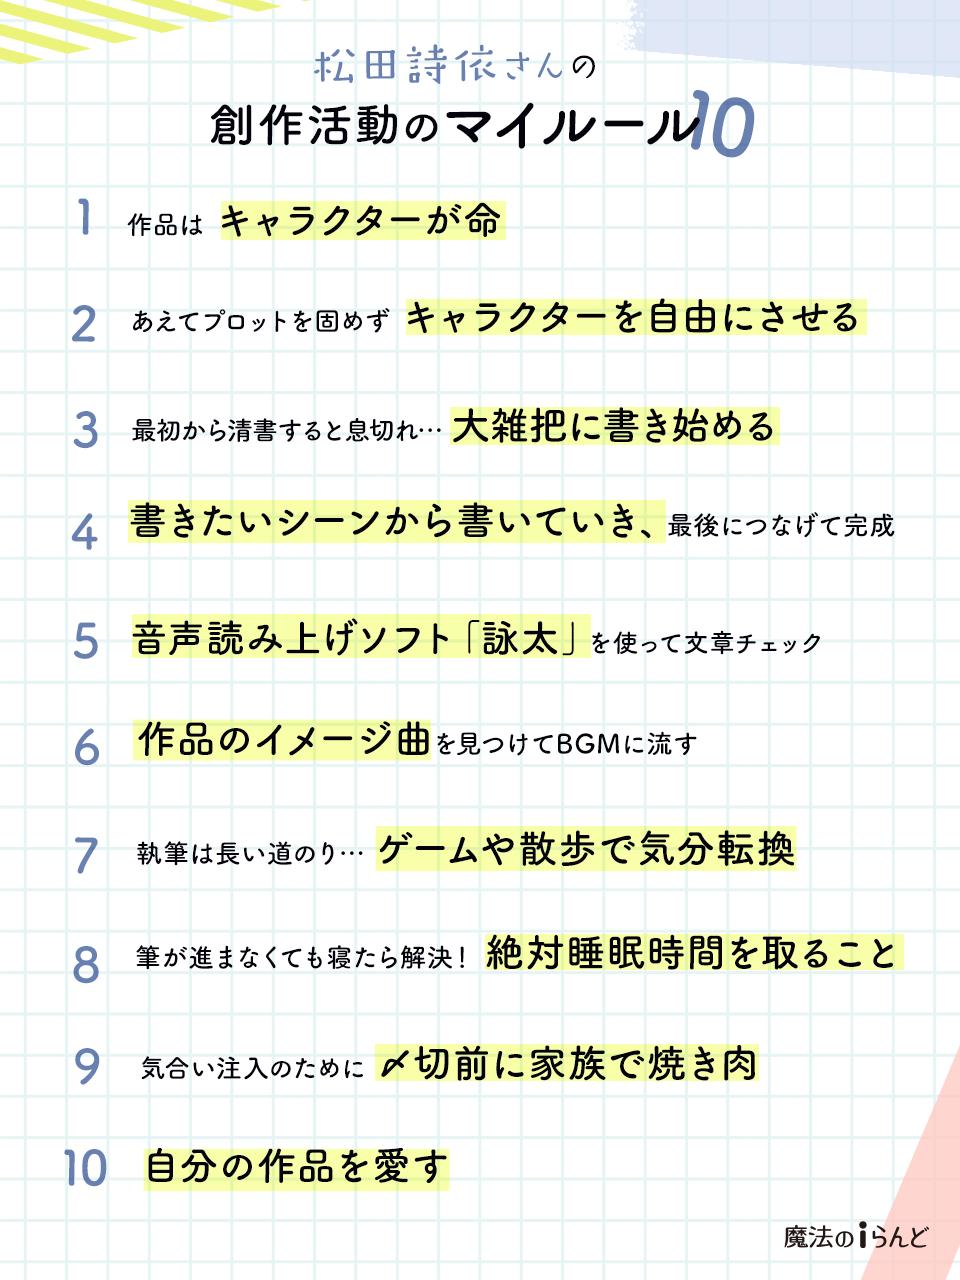 https://storage.googleapis.com/blog-info/entry/2021/08/210802-myrule_twitter-matsuda-tate.png